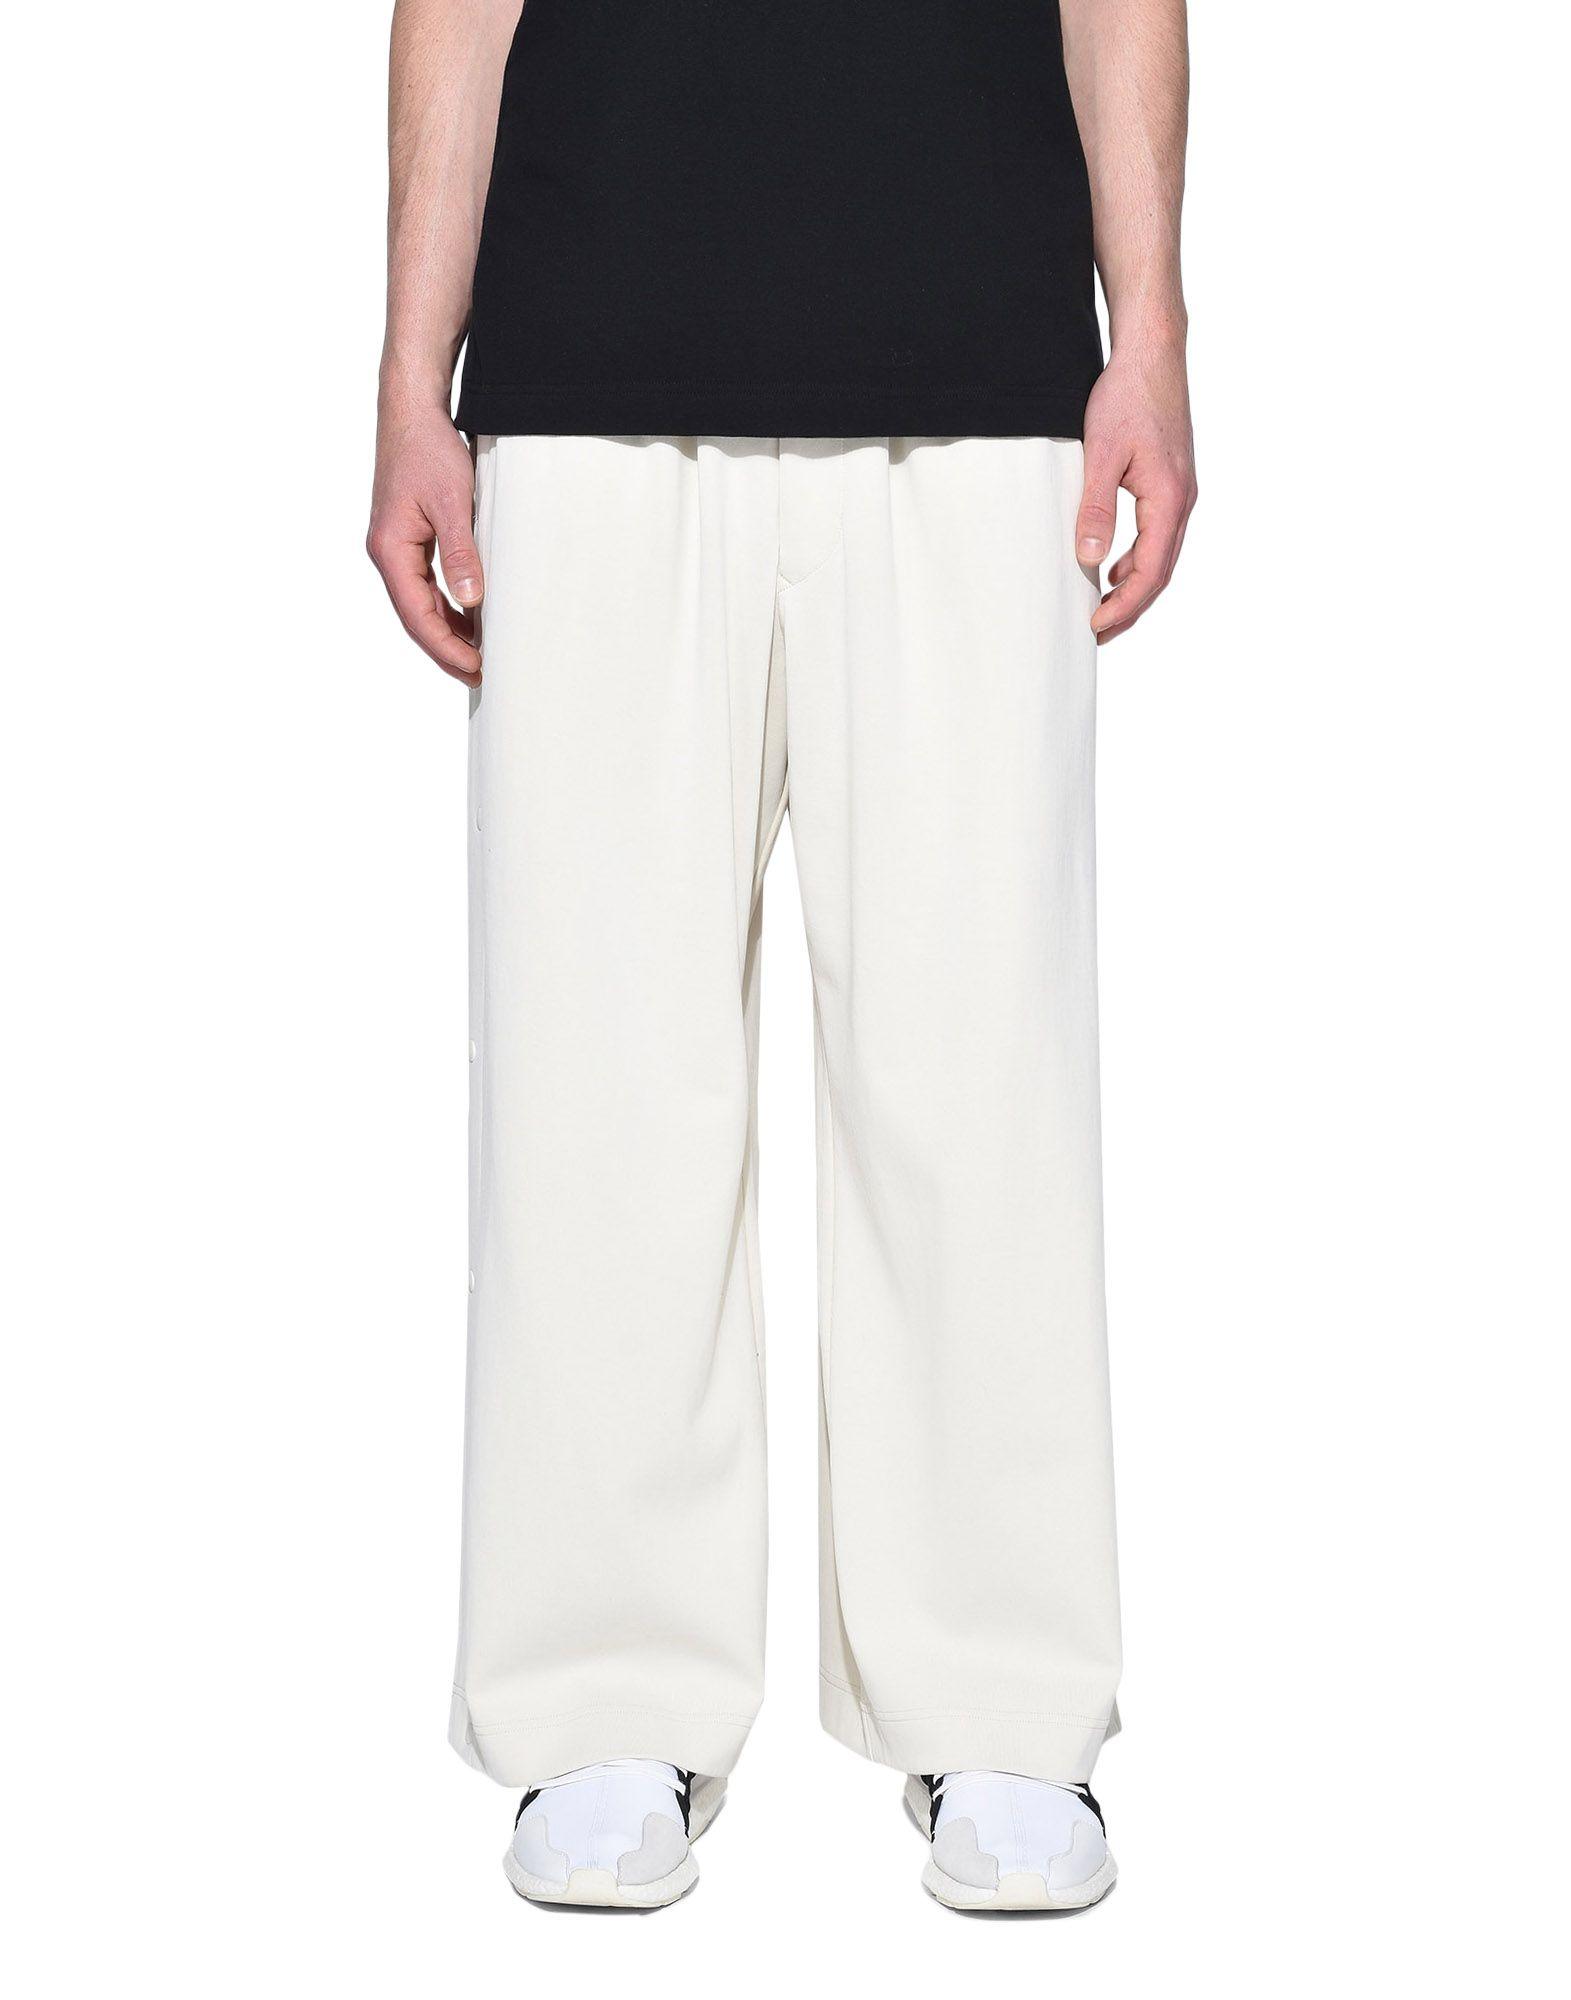 Y-3 Y-3 3-Stripes Matte Snap Track Pants Track pant Herren r